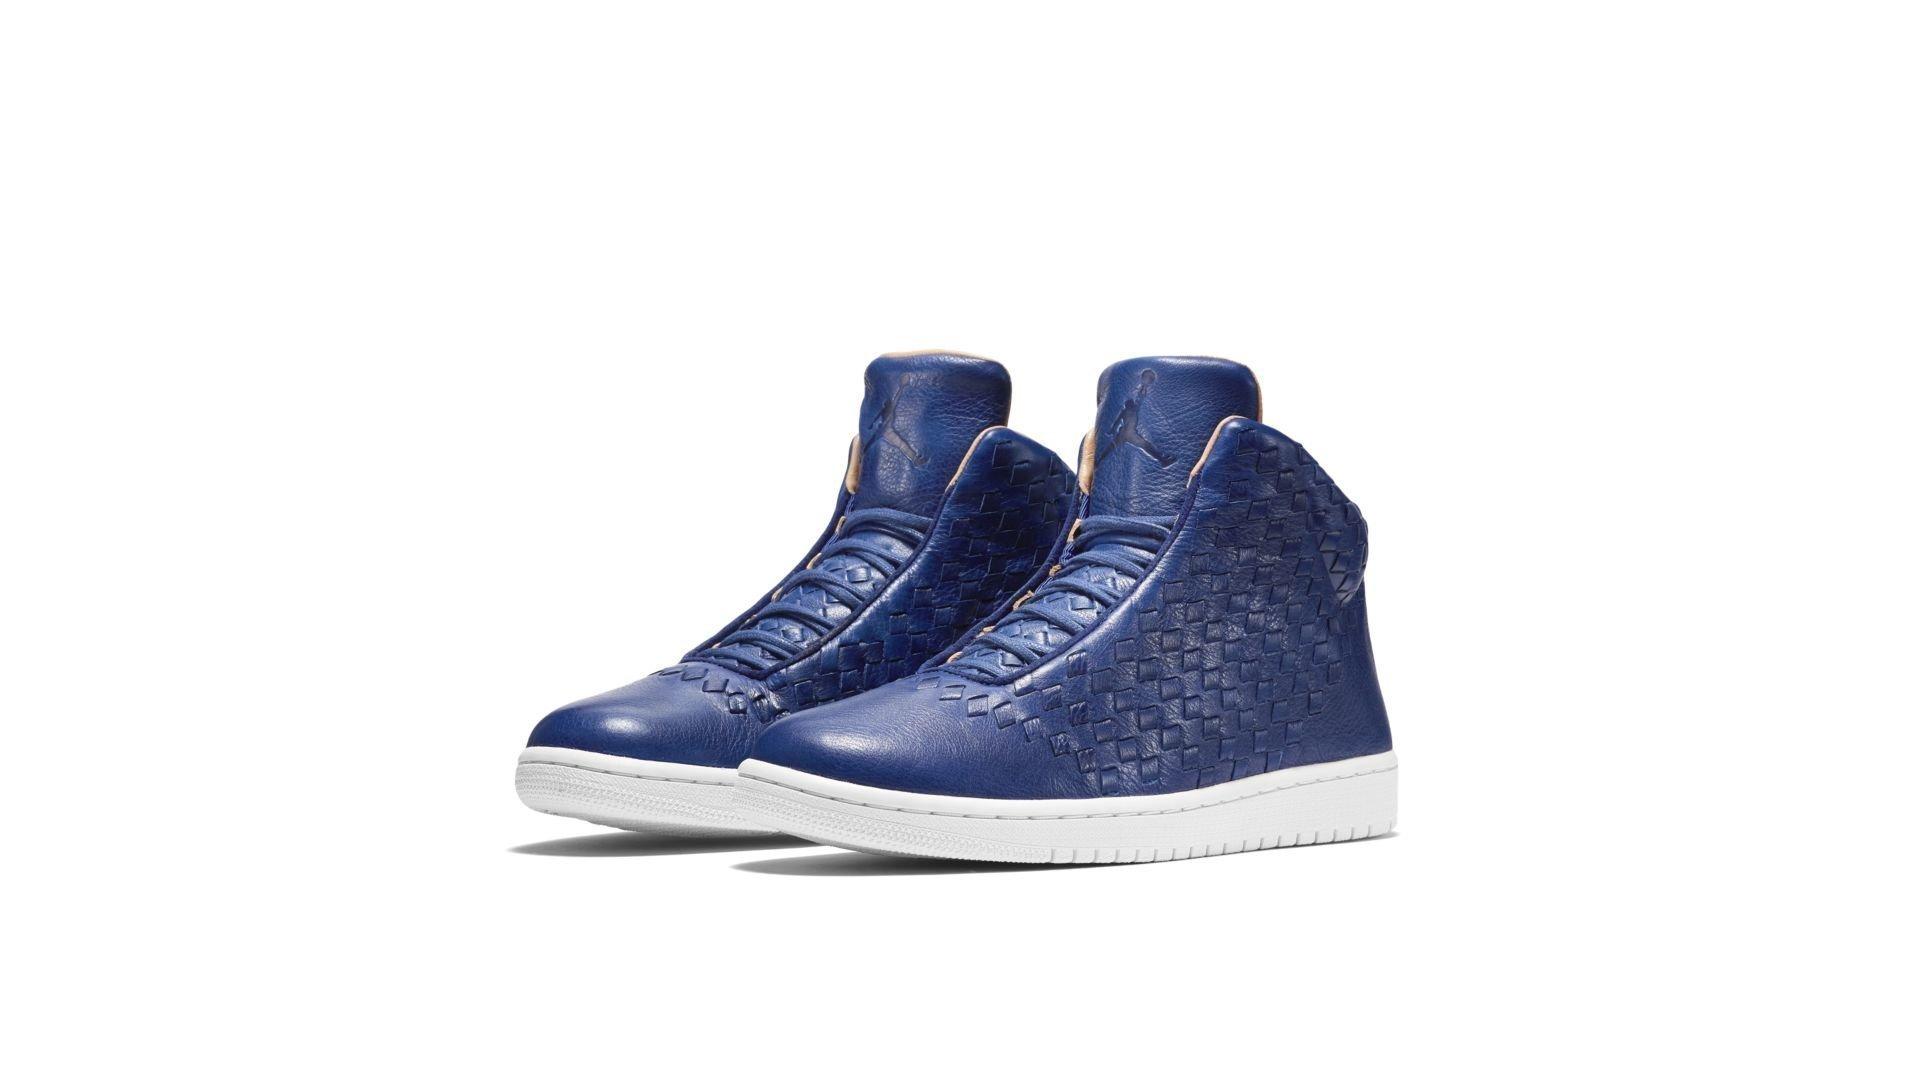 Jordan Shine Deep Royal Blue (689480-410)